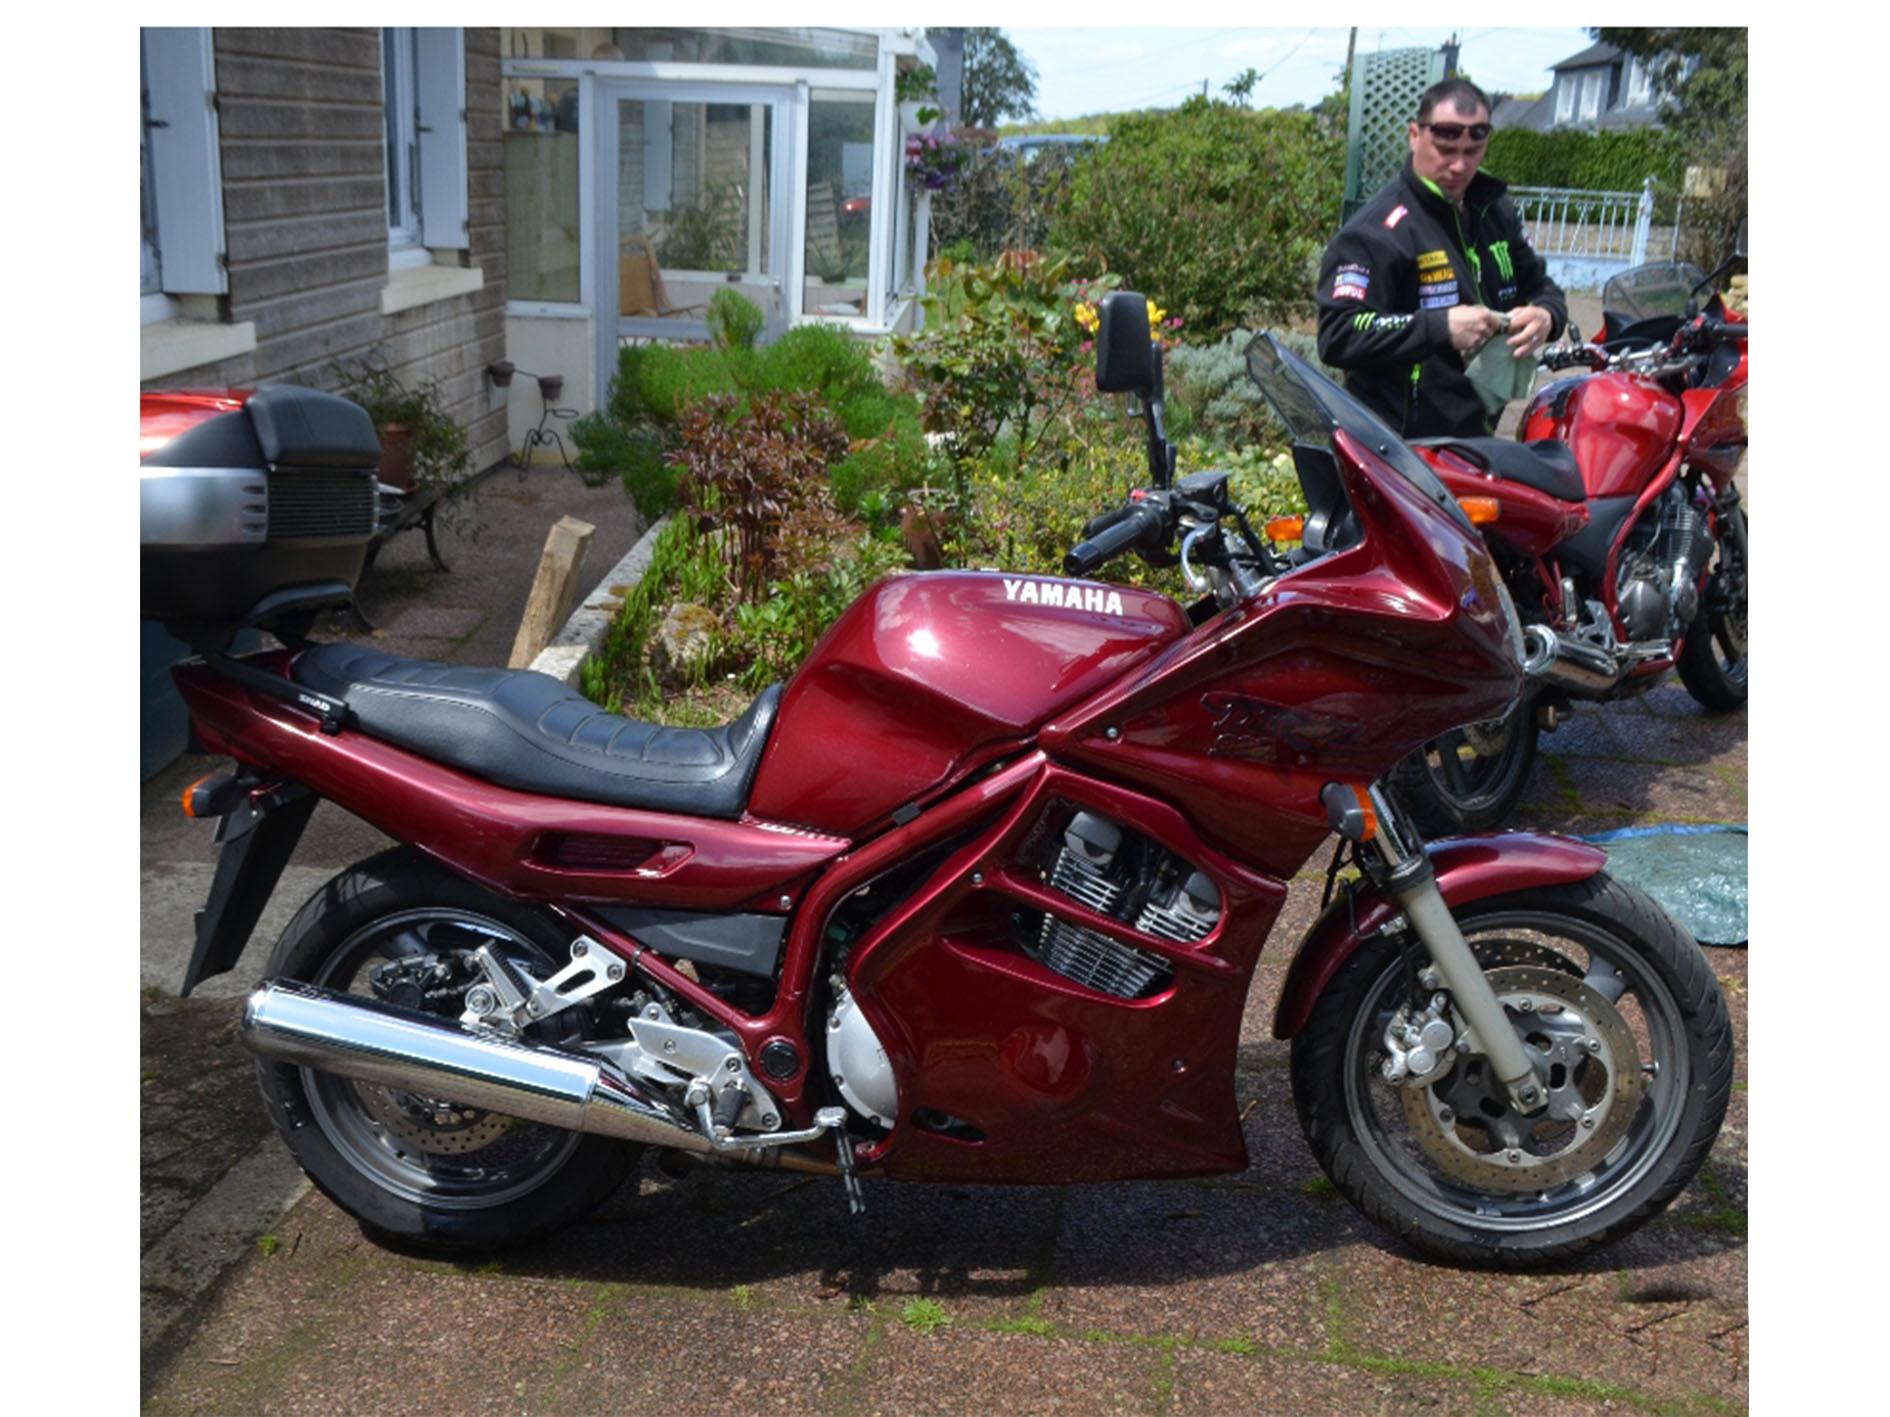 Moto Yamaha 900 diversion